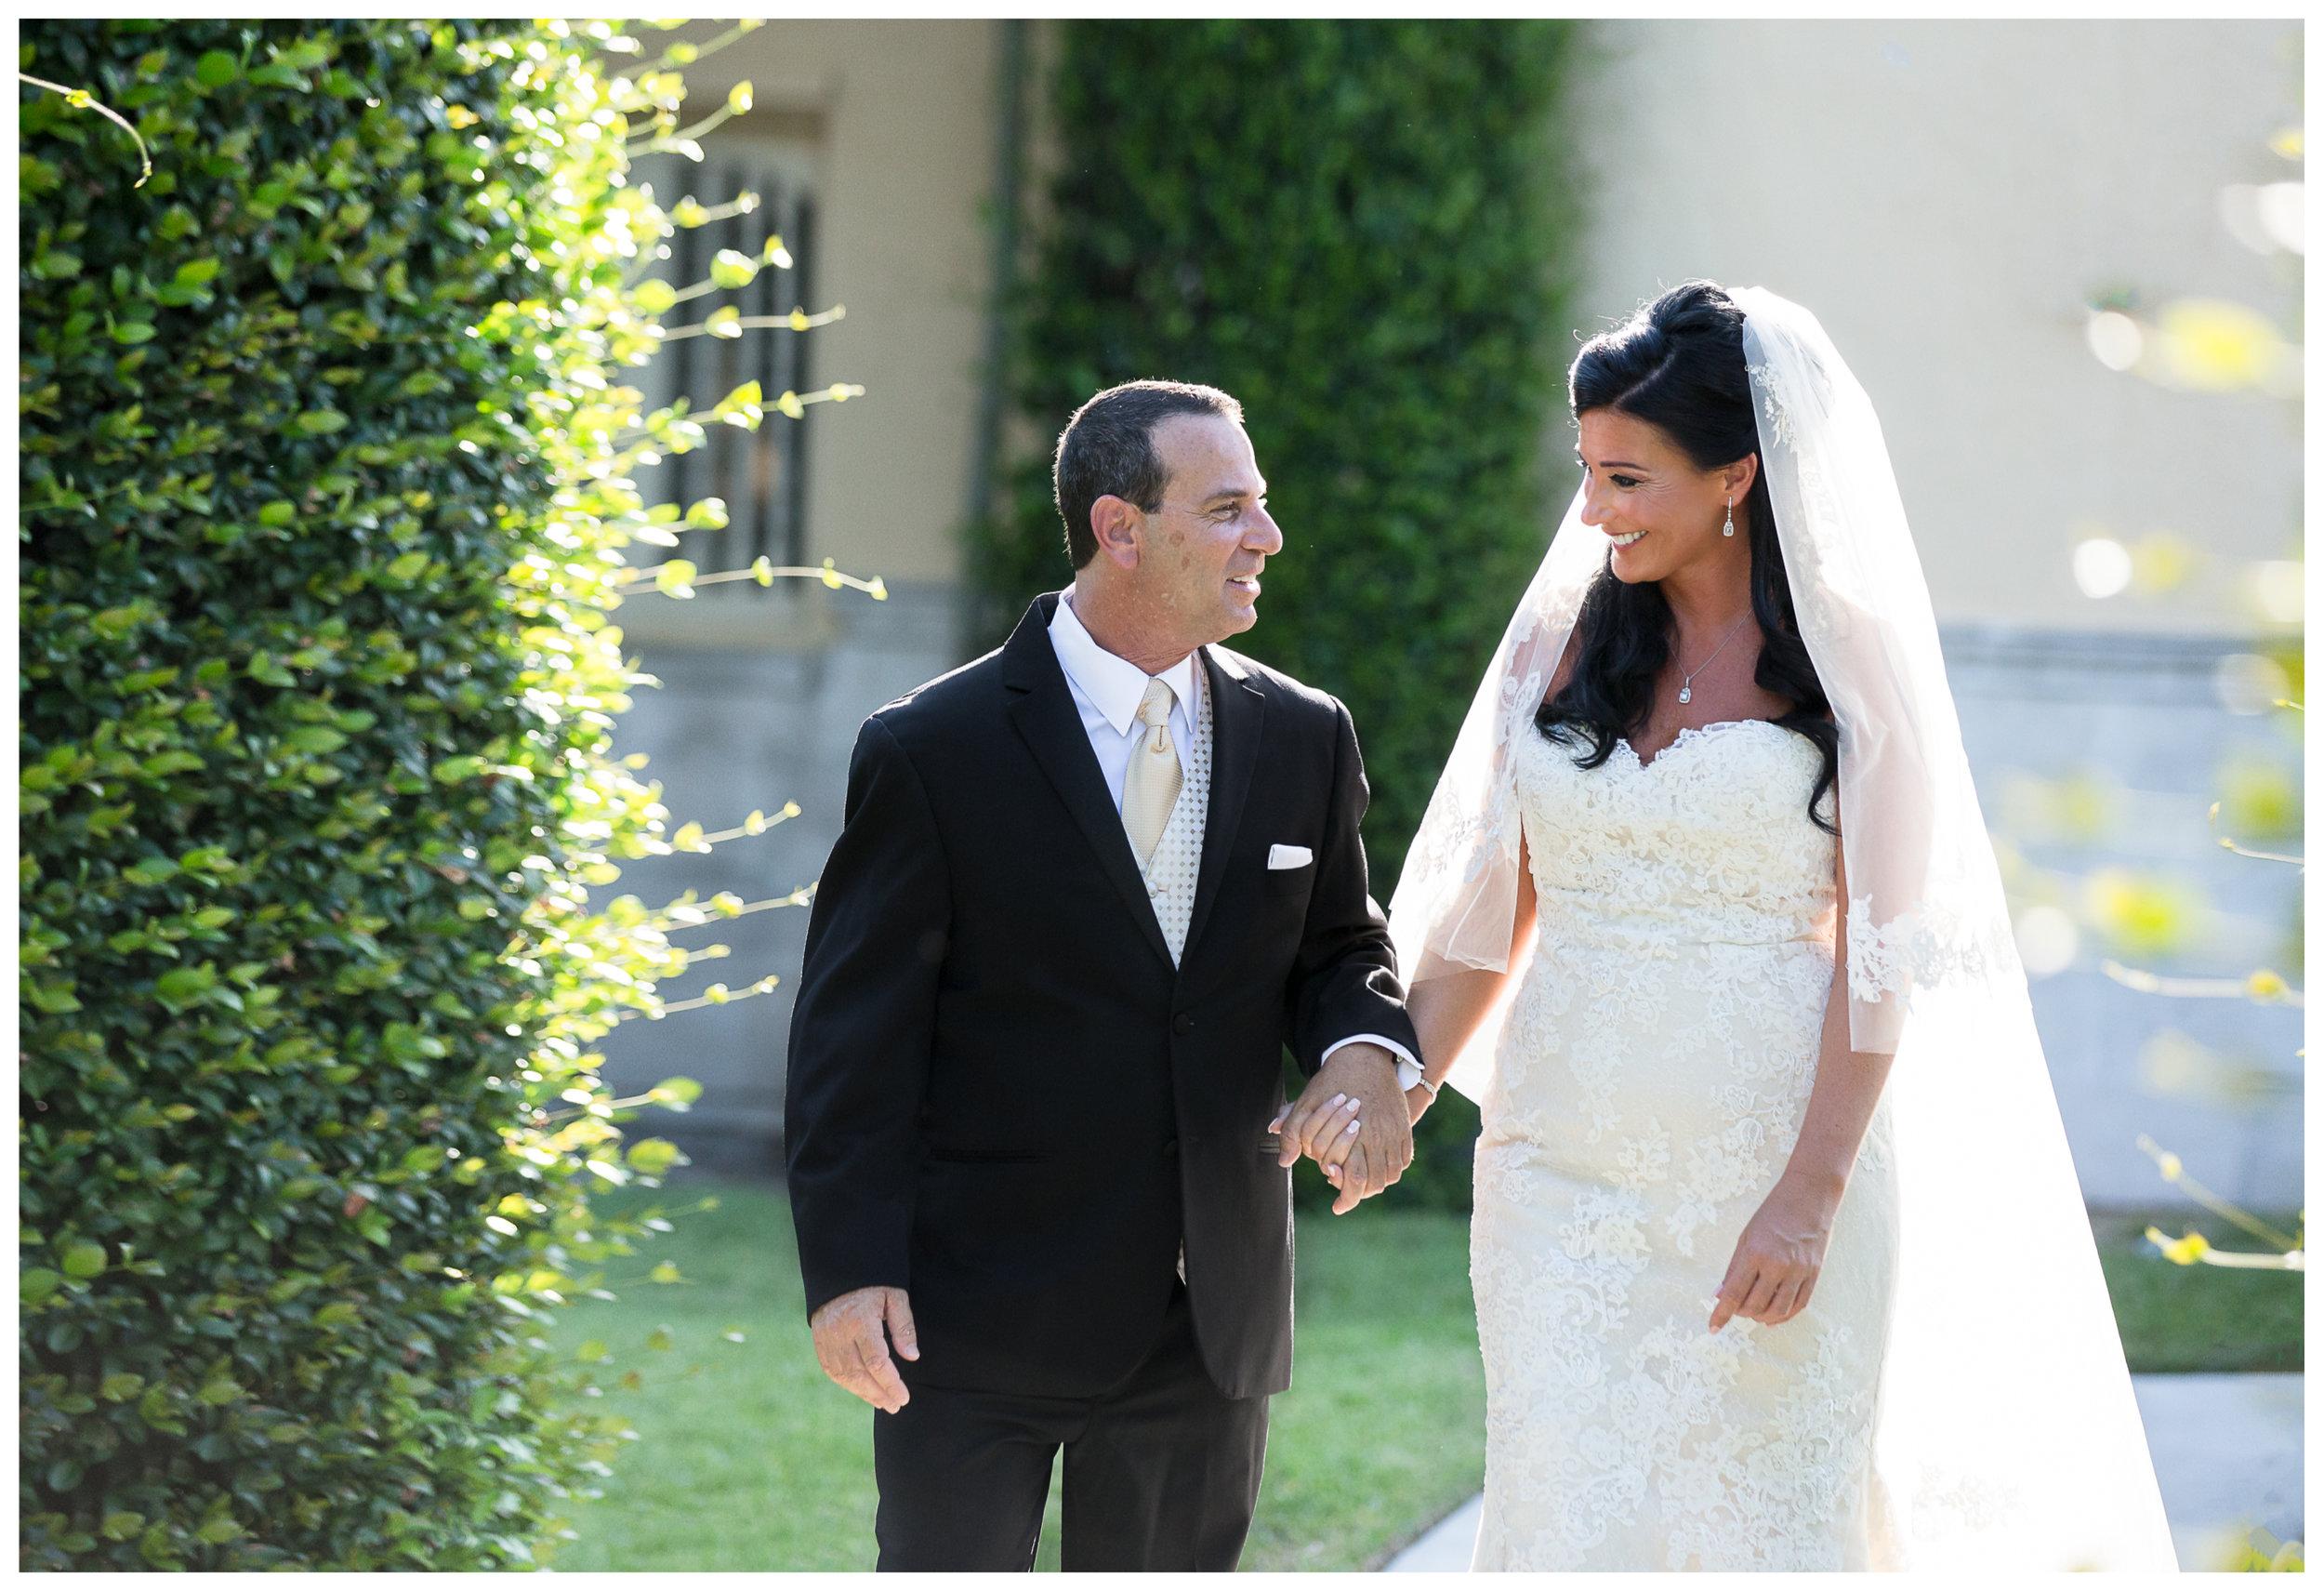 Benvenuto_Boynton_Beach_Wedding_Christine_and Doug_Married 5.jpg